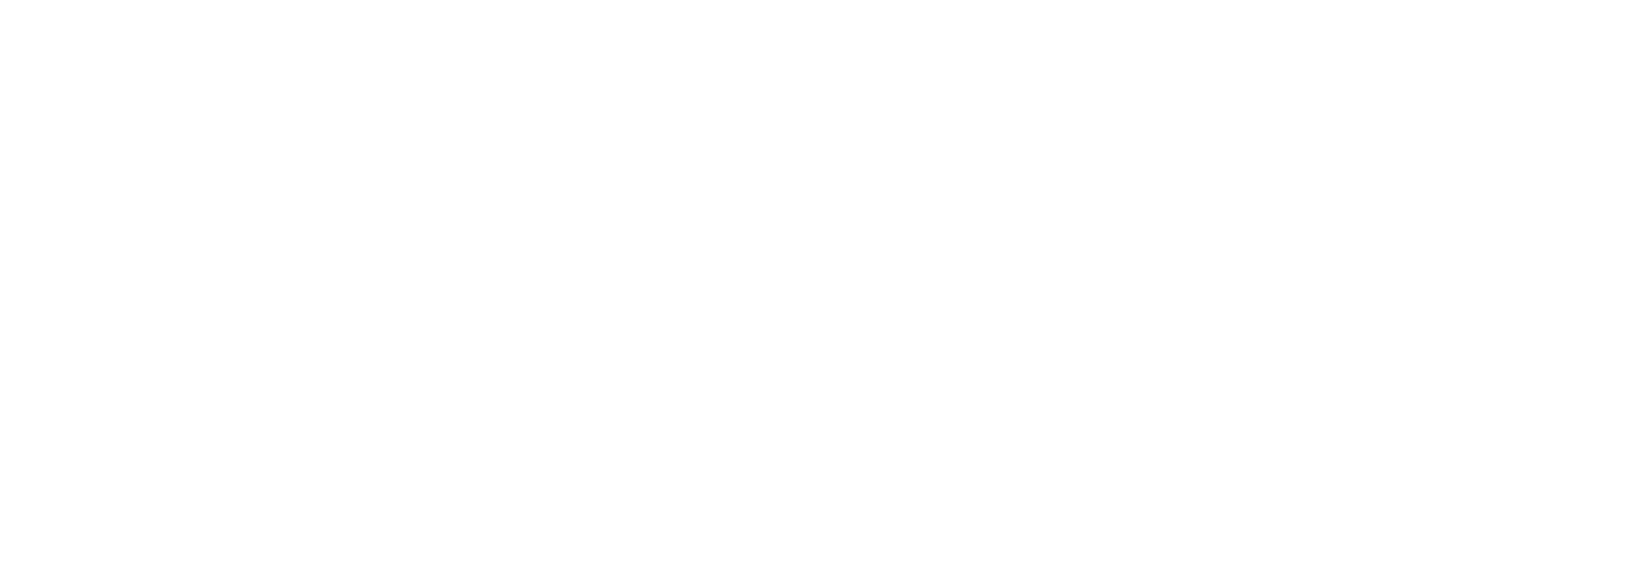 ILGA Asia Conf 2019 White logo - transparent (v)@4x.png